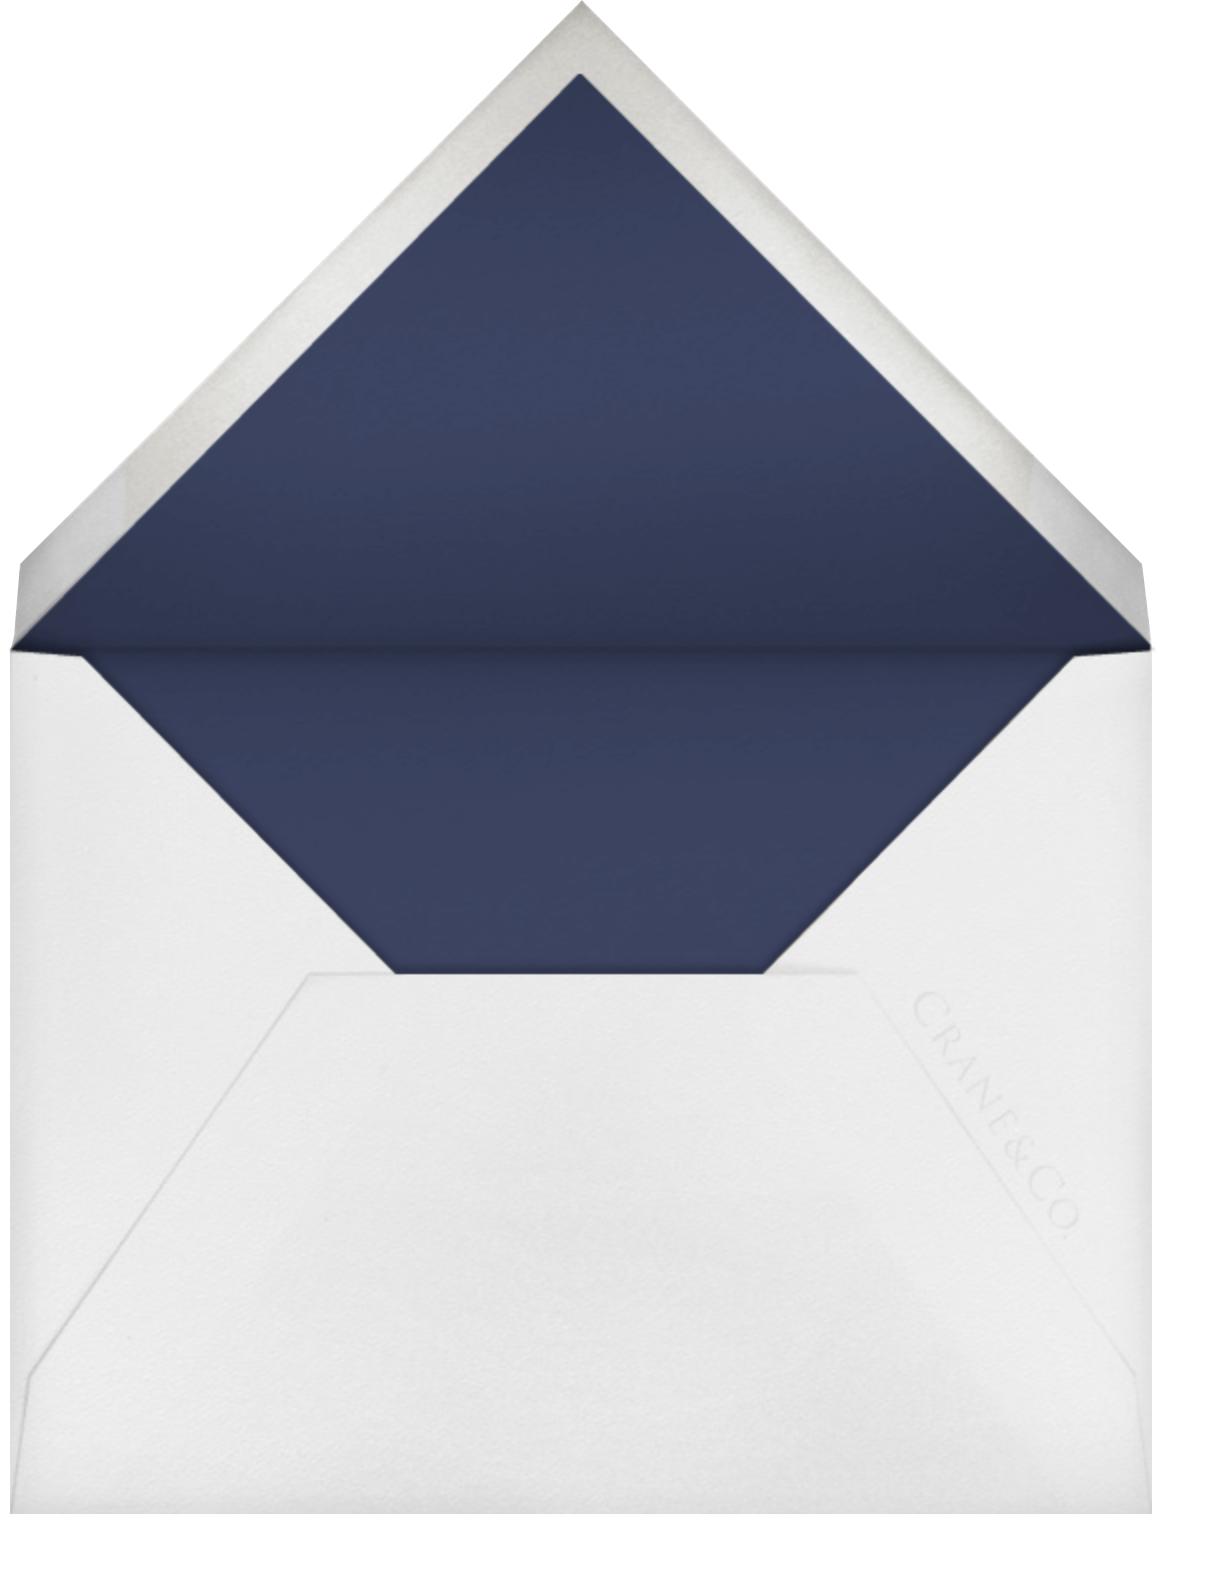 Bellomont (Thank You) - Navy - Crane & Co. - Personalized stationery - envelope back